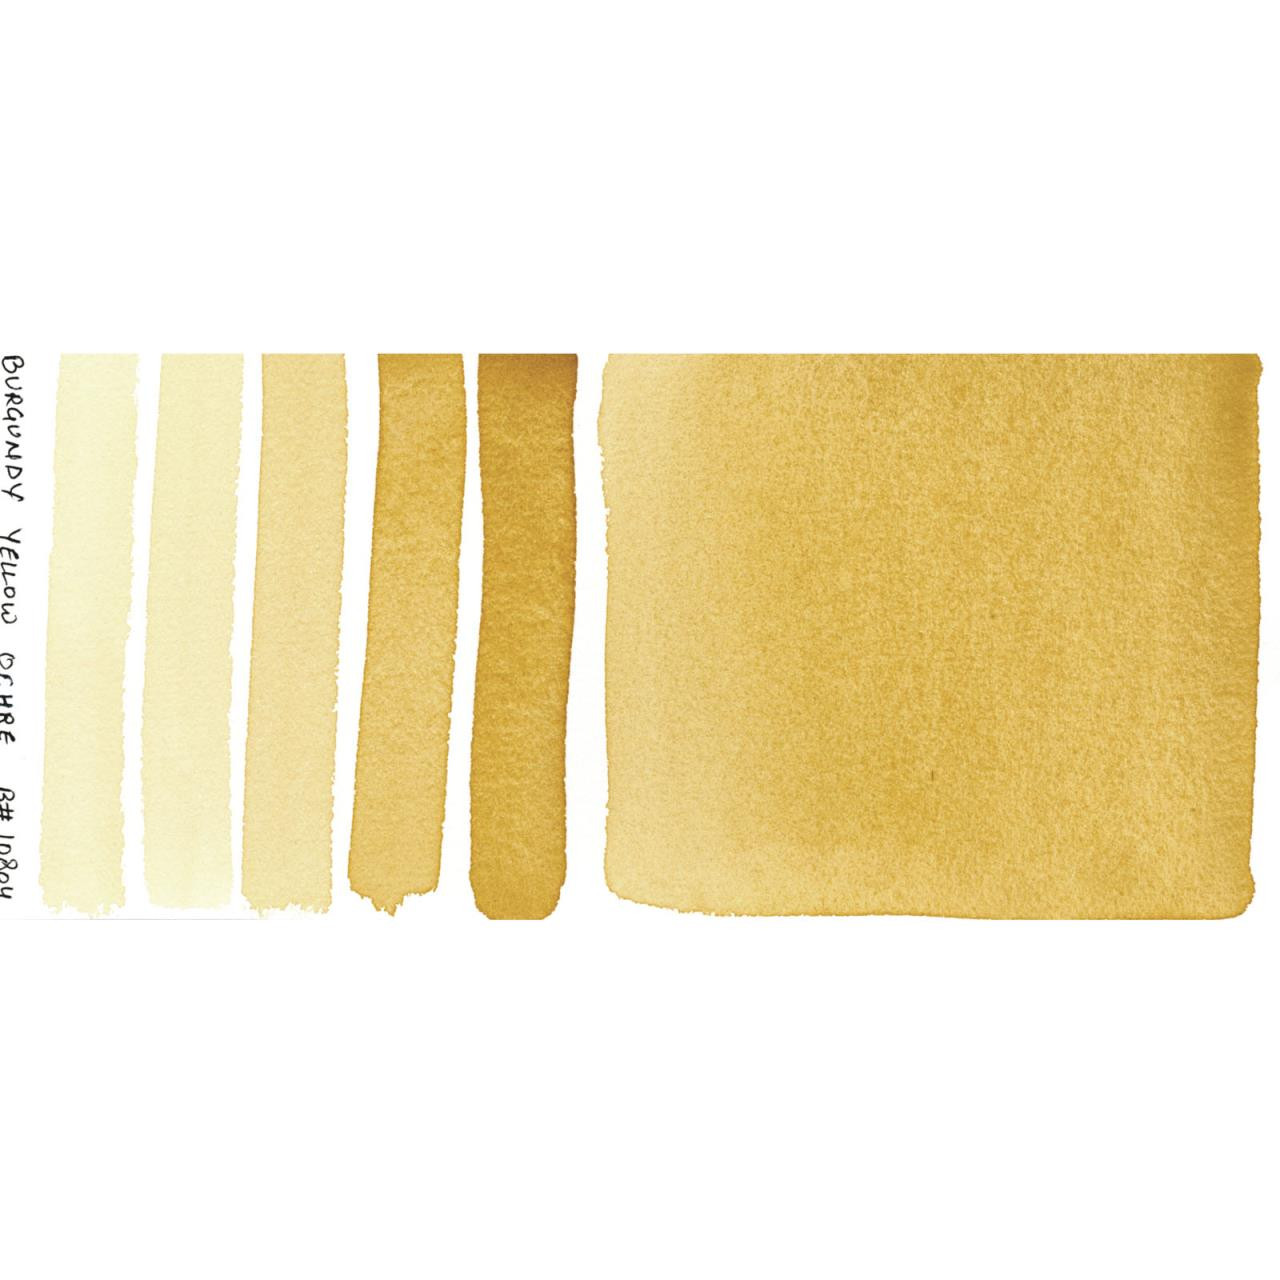 Burgundy Yellow Ochre, DANIEL SMITH Extra Fine Watercolors 15ml Tubes -